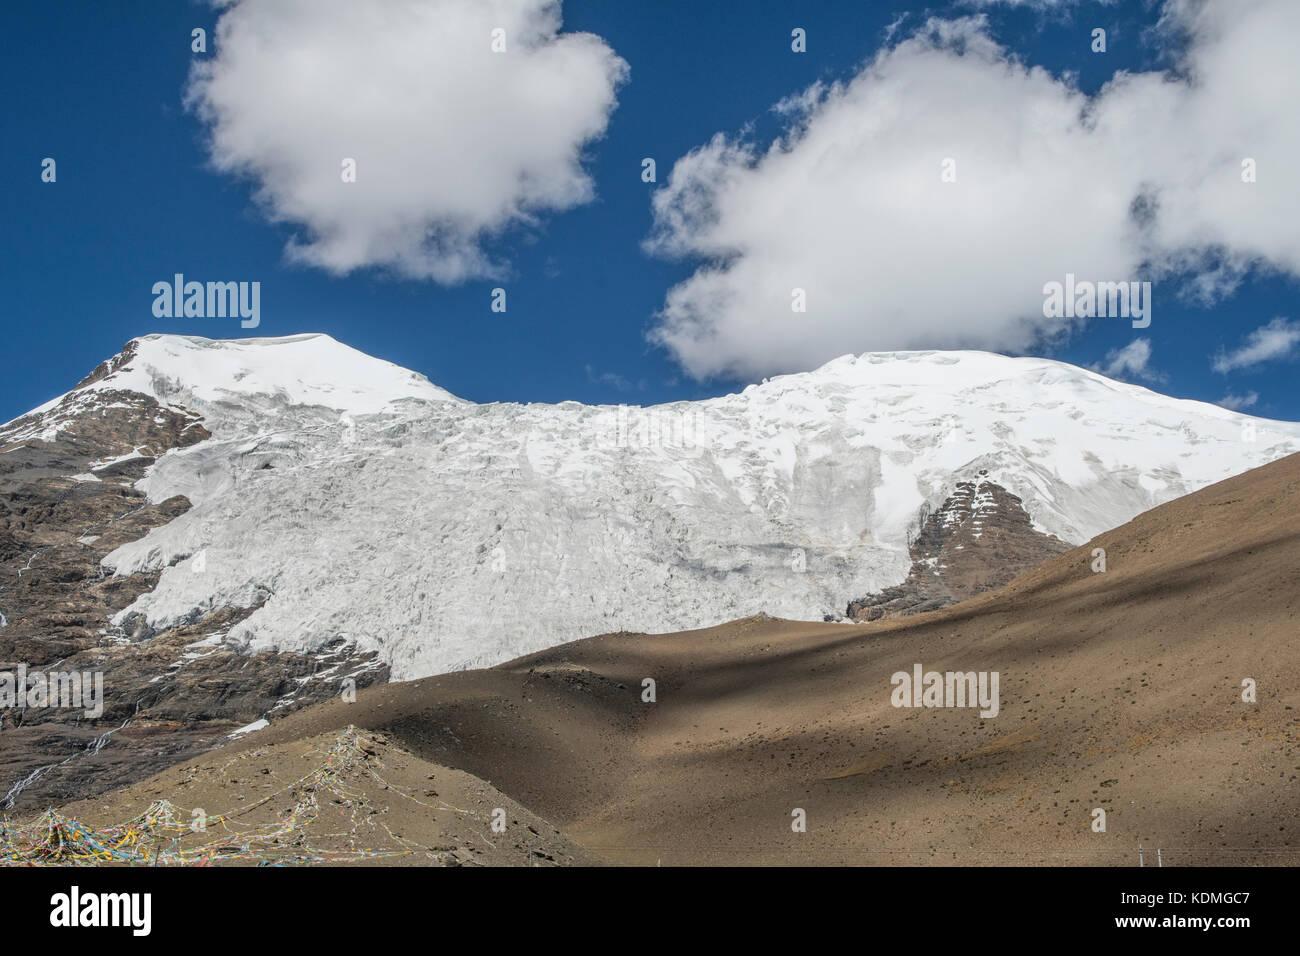 Karola Glacier, Shannan, Tibet, China - Stock Image